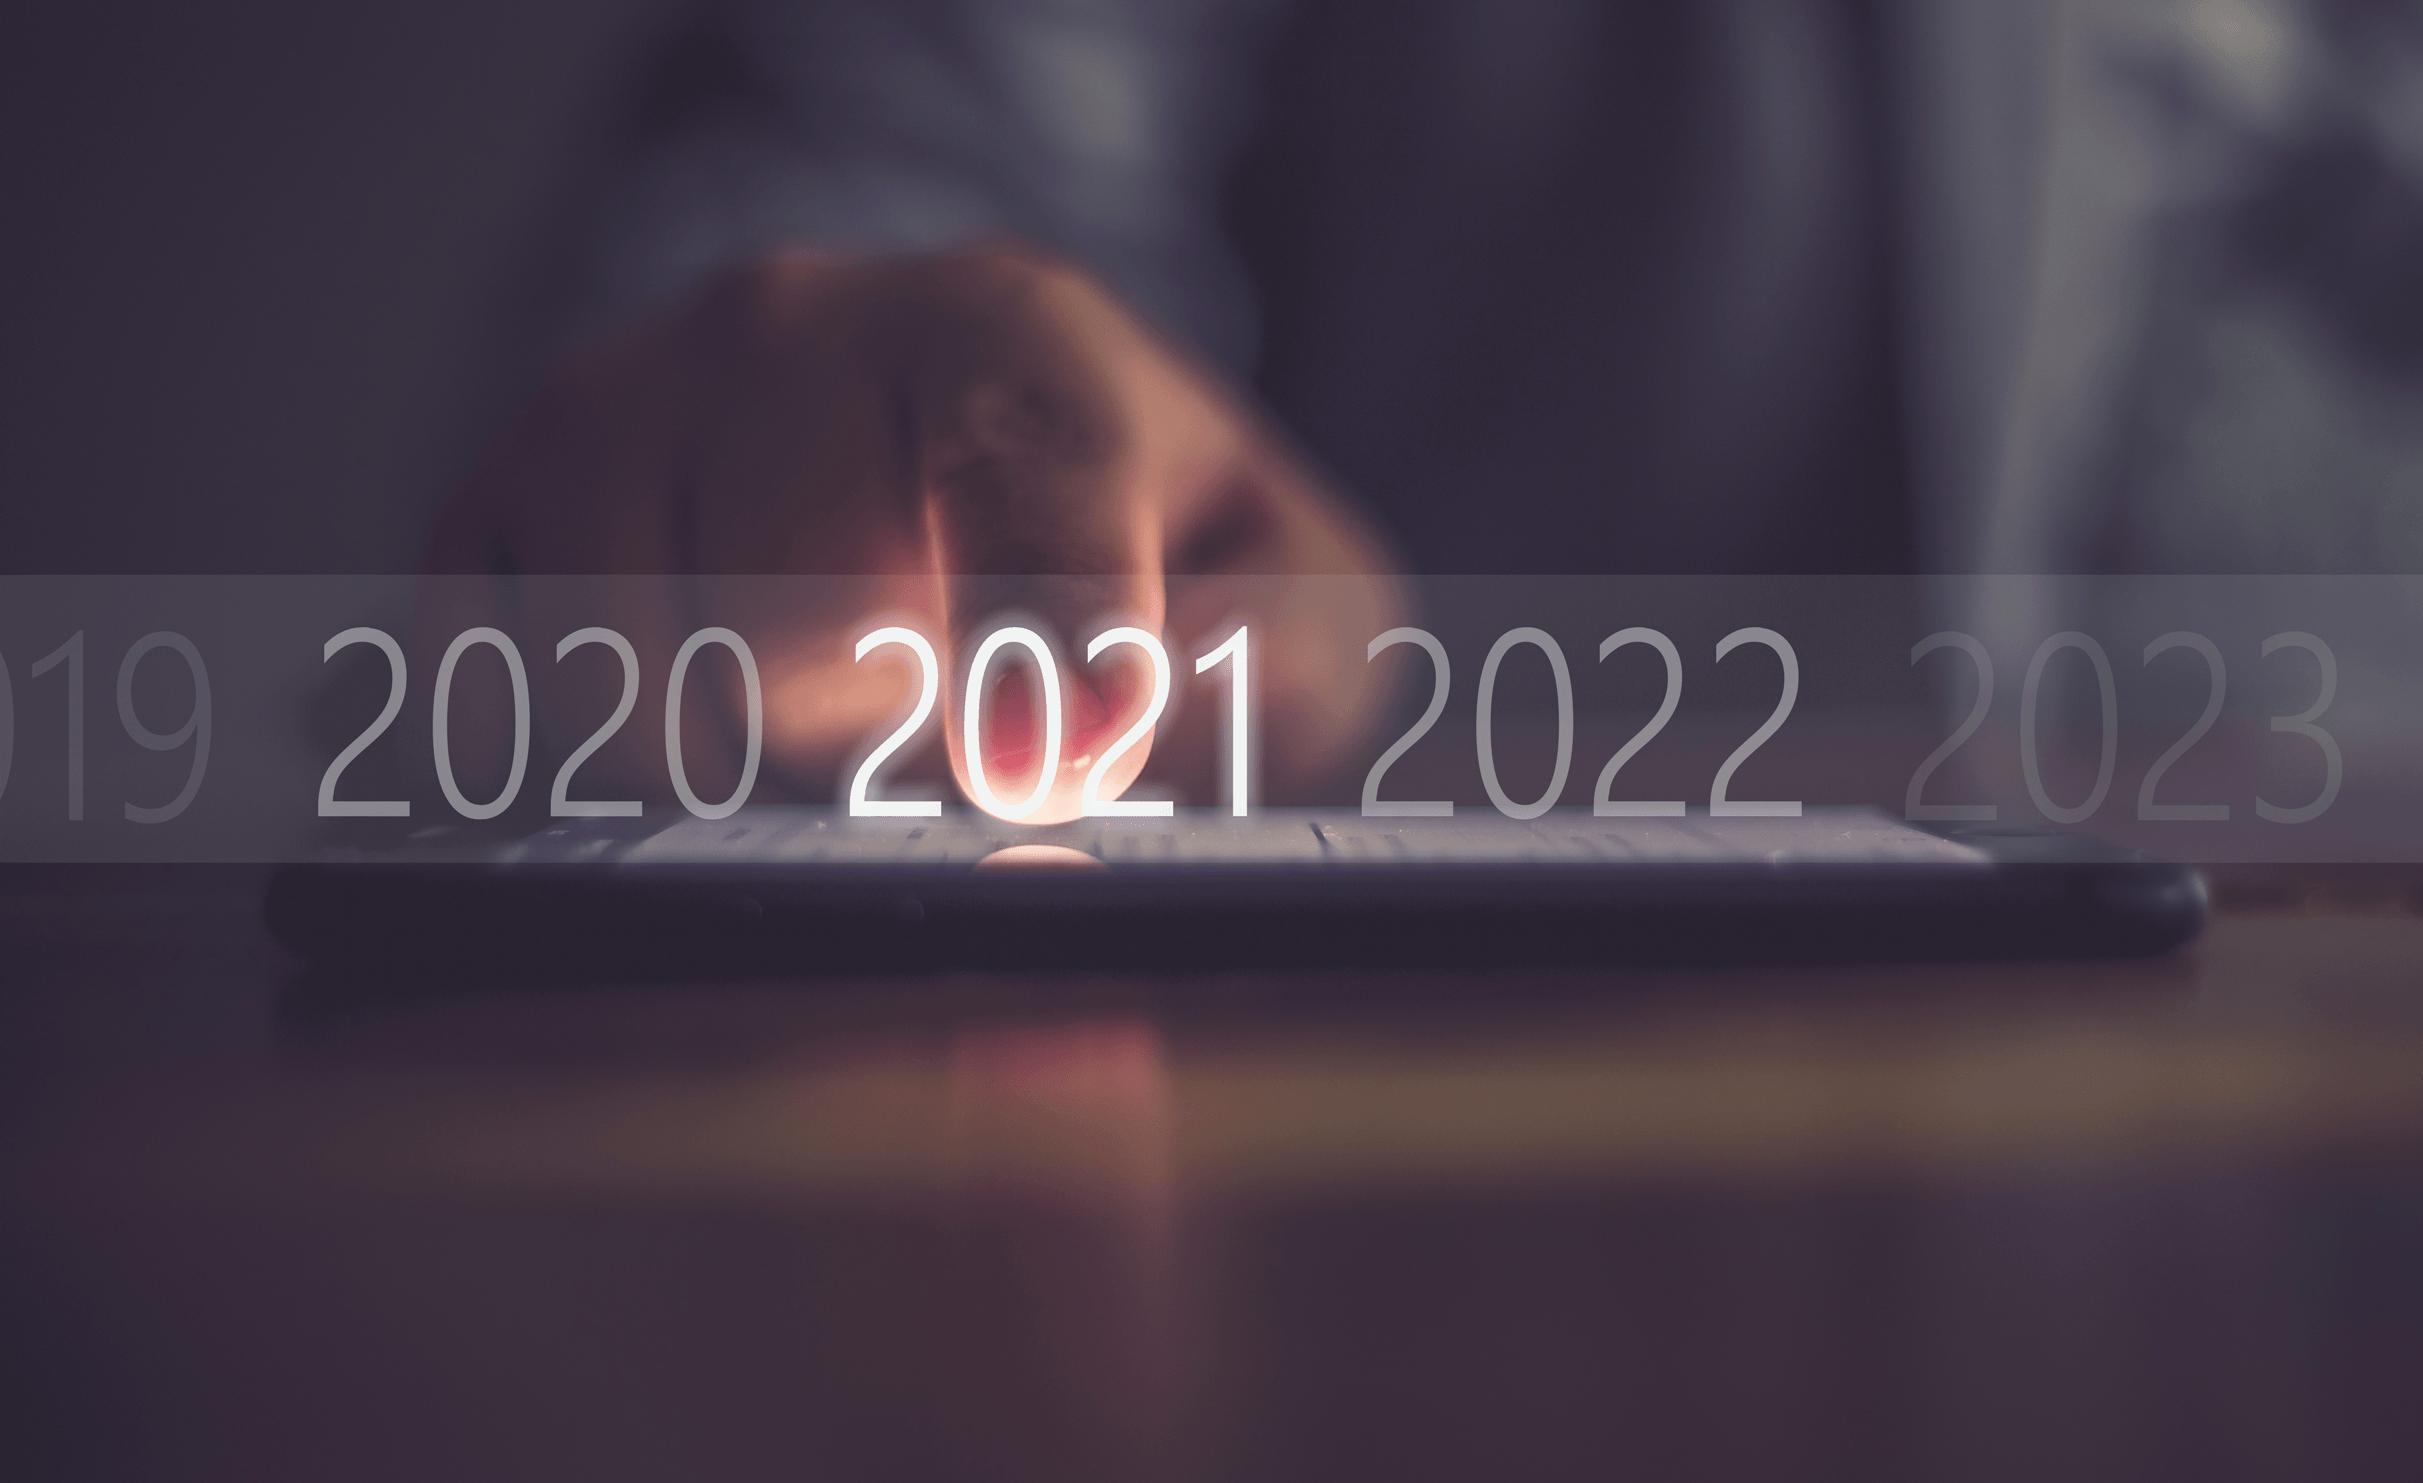 5 Key Factors Influencing Strategic Planning in 2021